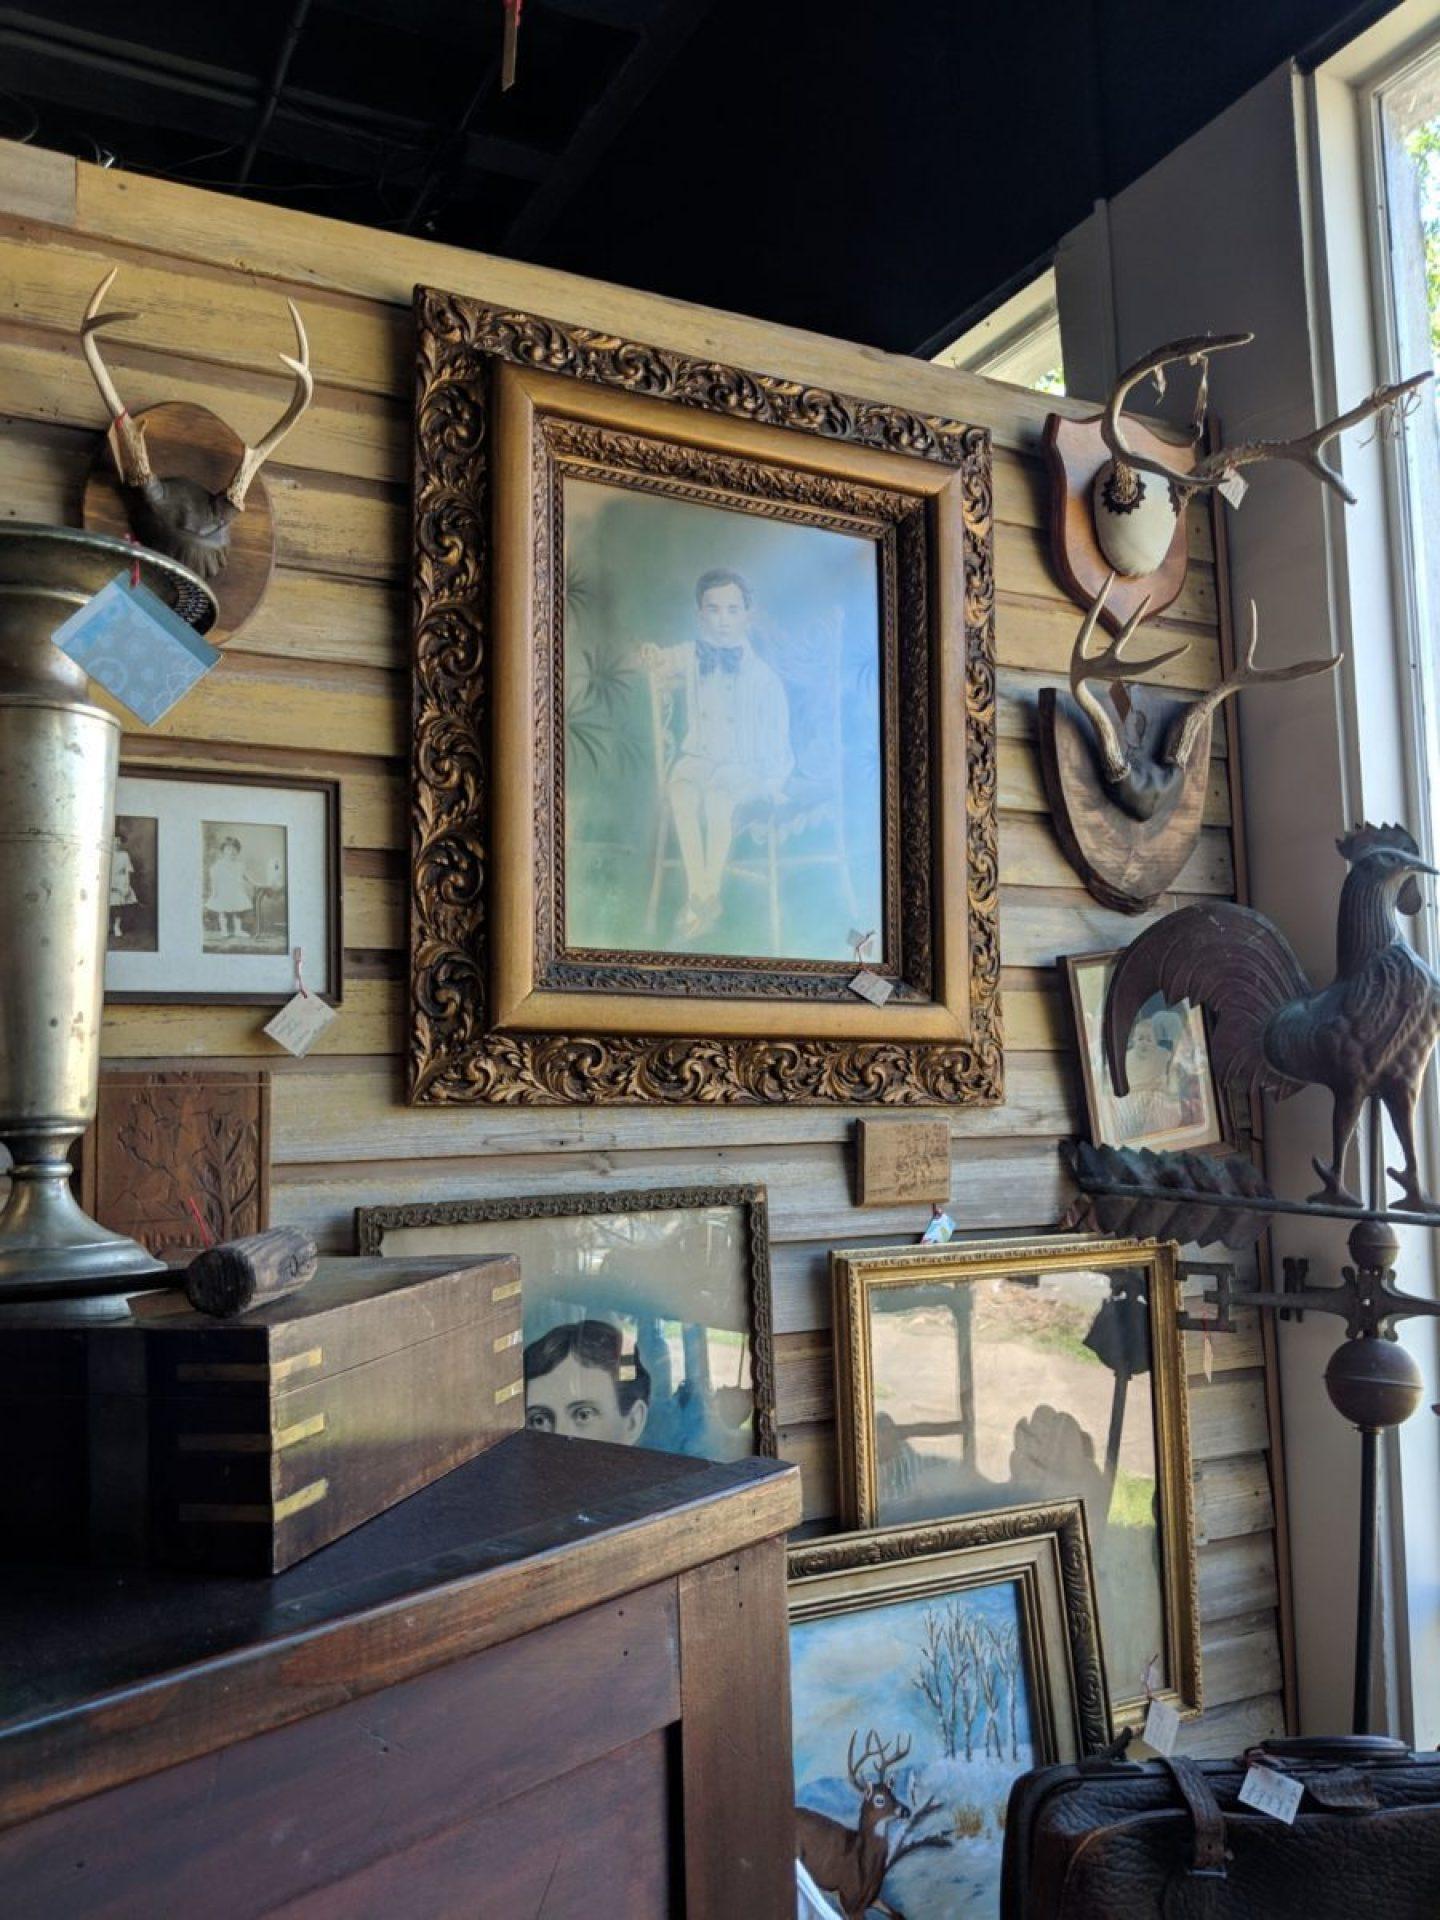 IMG_20190505_144908-1440x1920 Arkansas Delta Family Road Trip:  Black Heritage, Art & More!